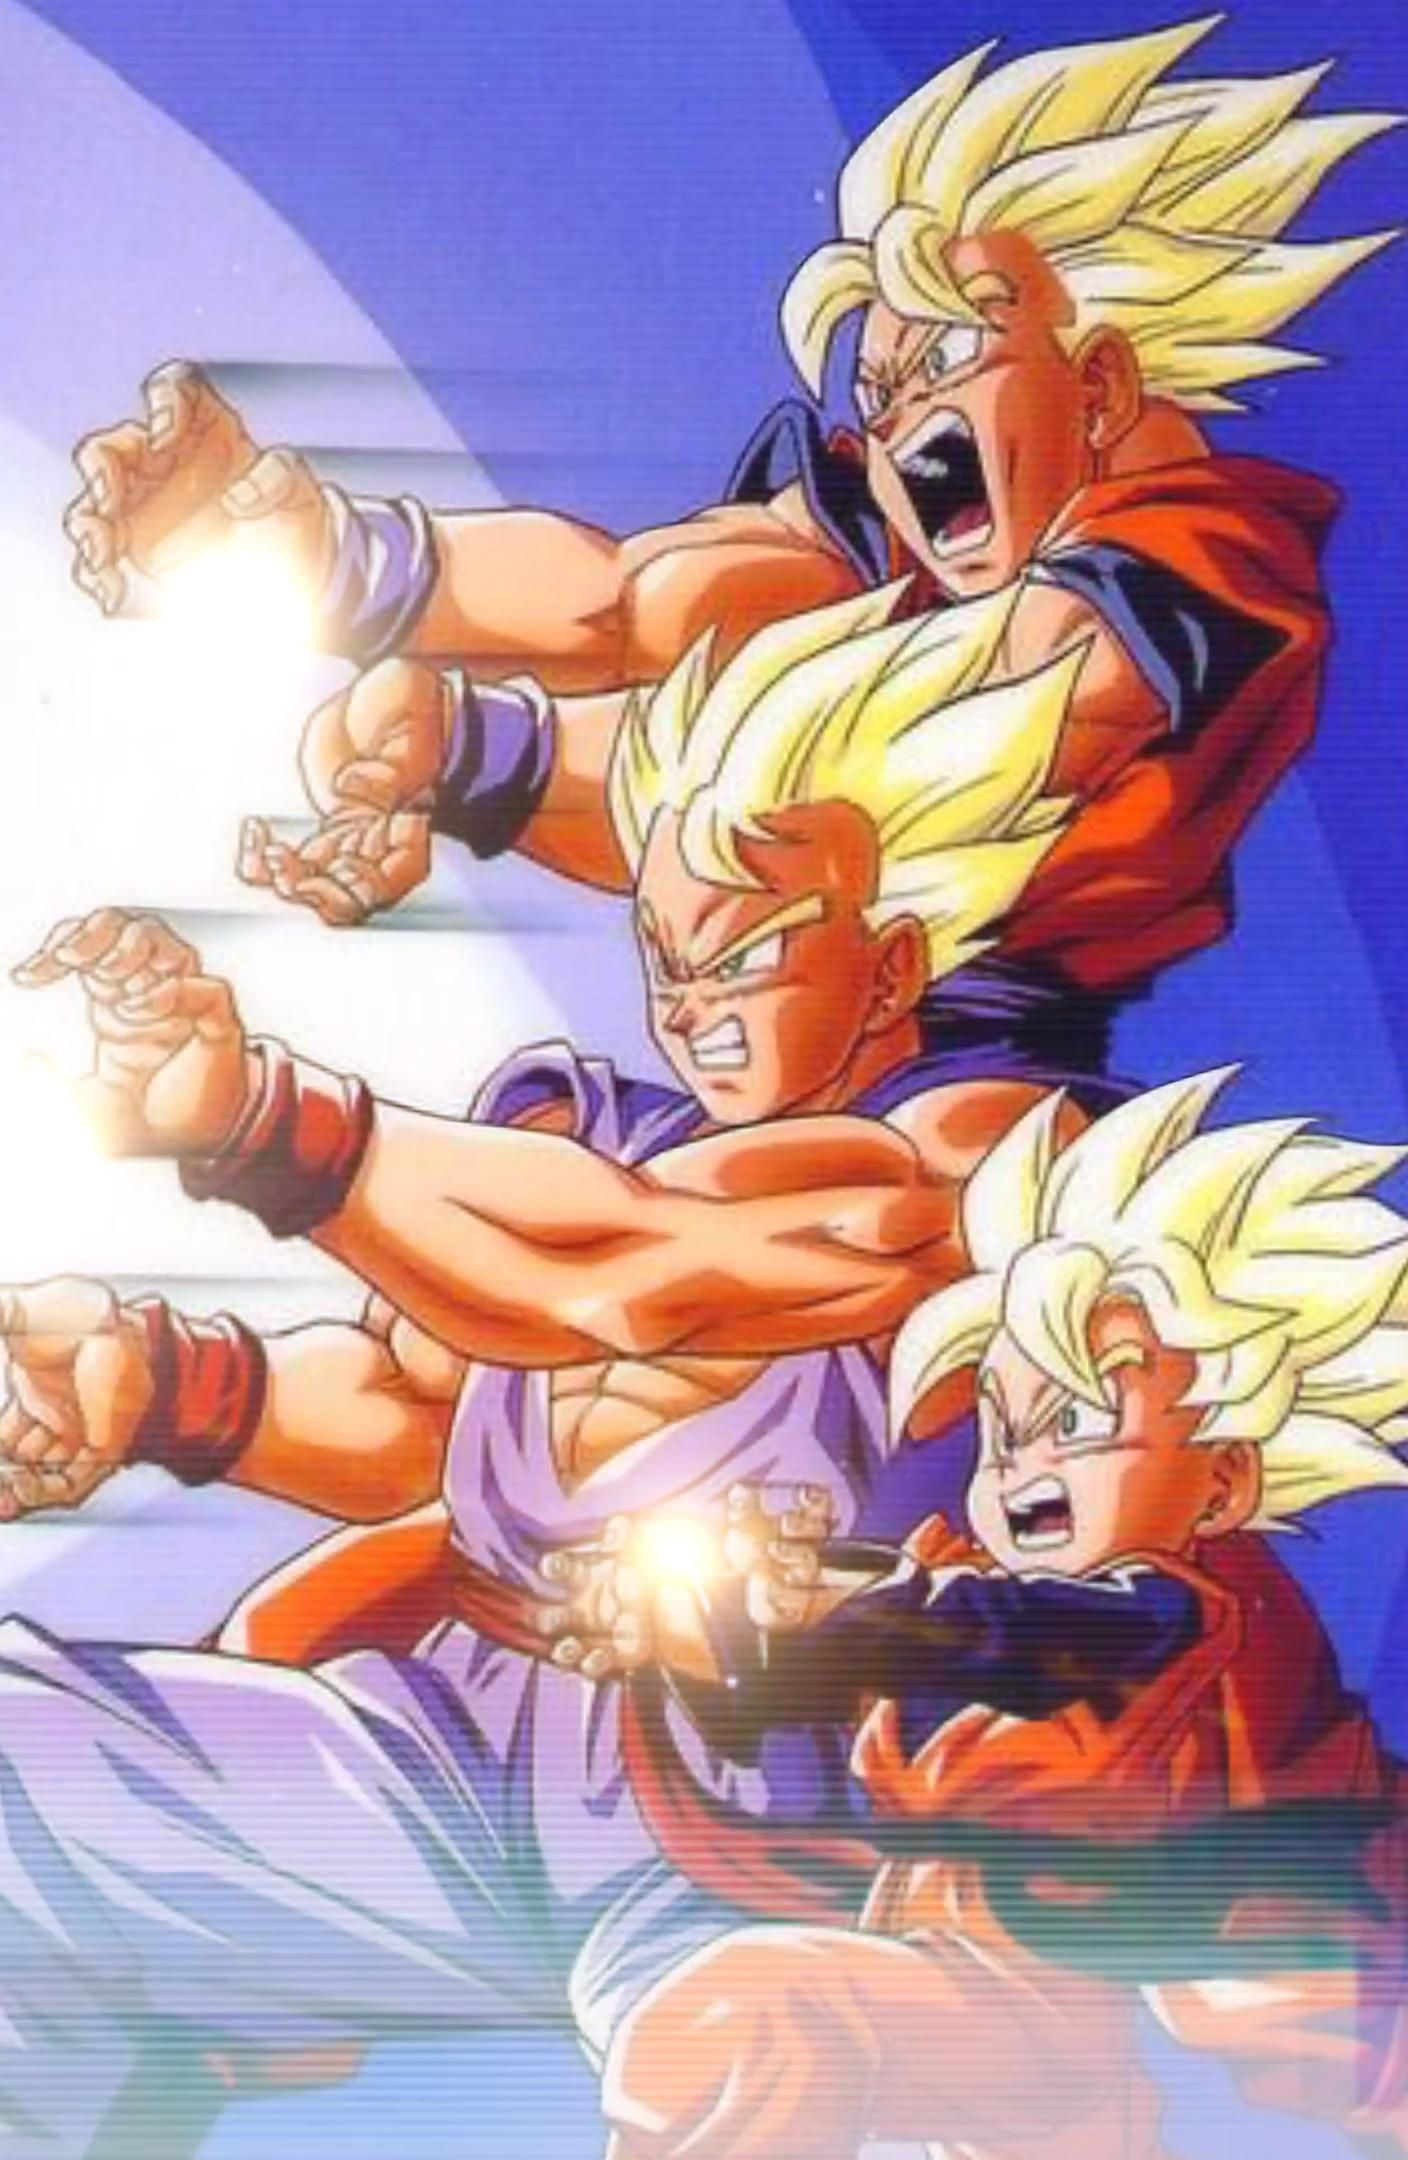 Family Kamehameha Video Anime Dragon Ball Super Manga Dragon Ball